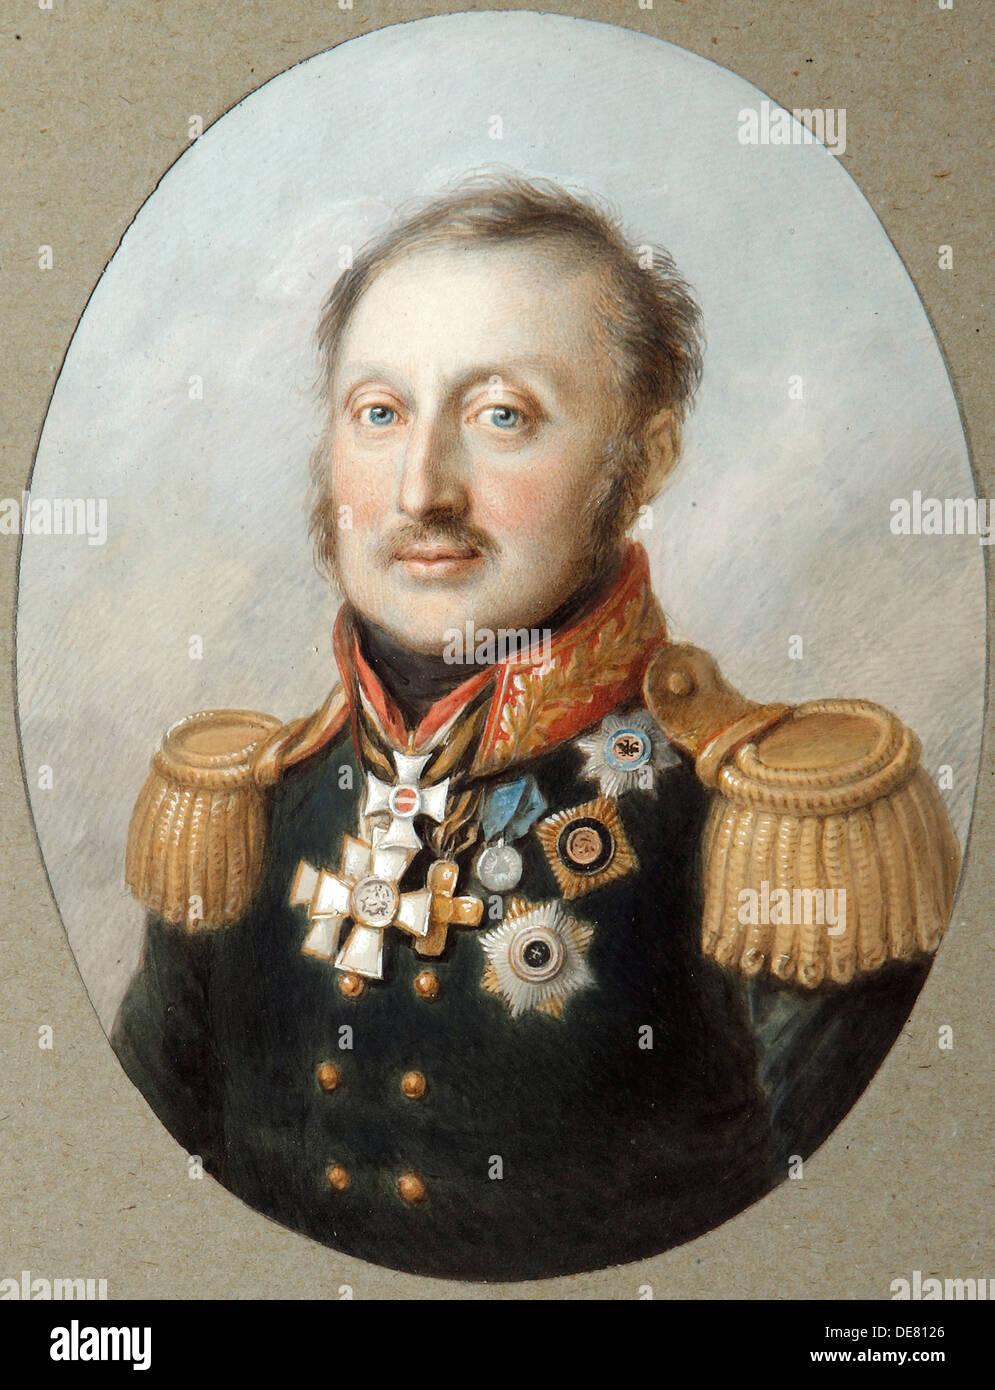 Field Marshal Count Ludwig Adolf Peter of Sayn-Wittgenstein-Ludwigsburg, (1769-1843), 1814. - Stock Image